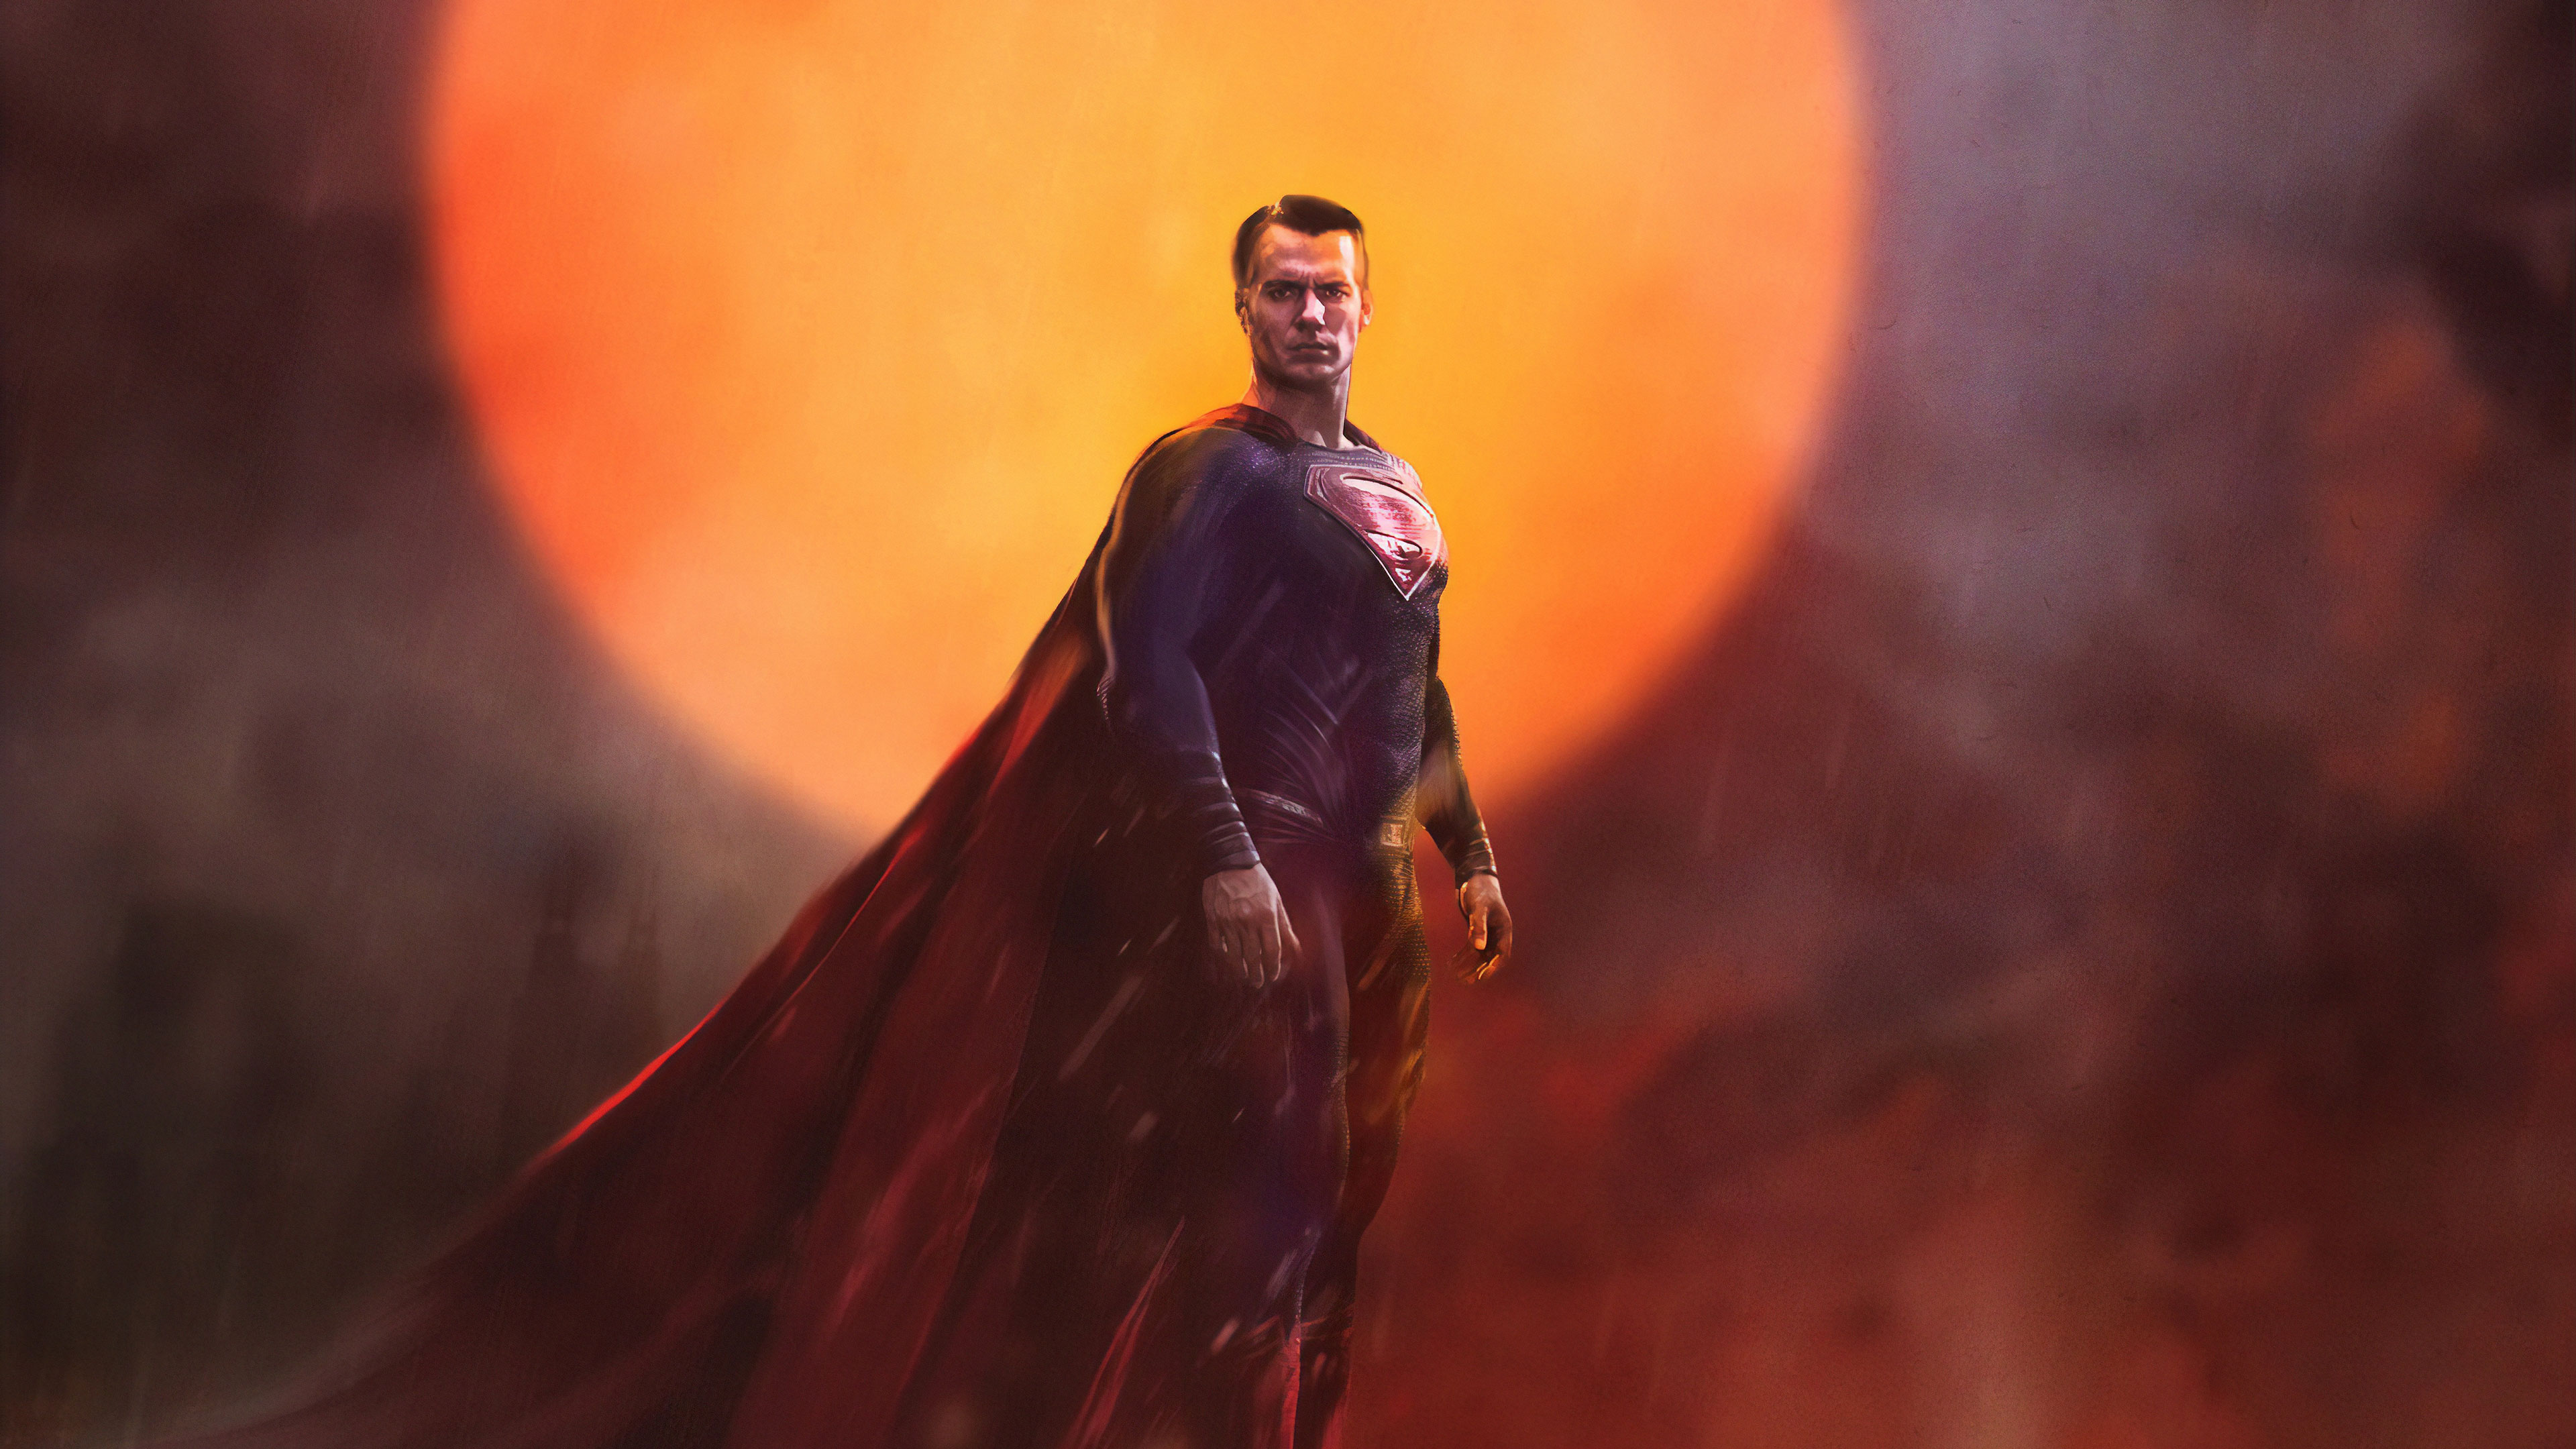 superman henry cavill 1570918951 - Superman Henry Cavill - superman wallpapers, superheroes wallpapers, hd-wallpapers, digital art wallpapers, artwork wallpapers, 4k-wallpapers